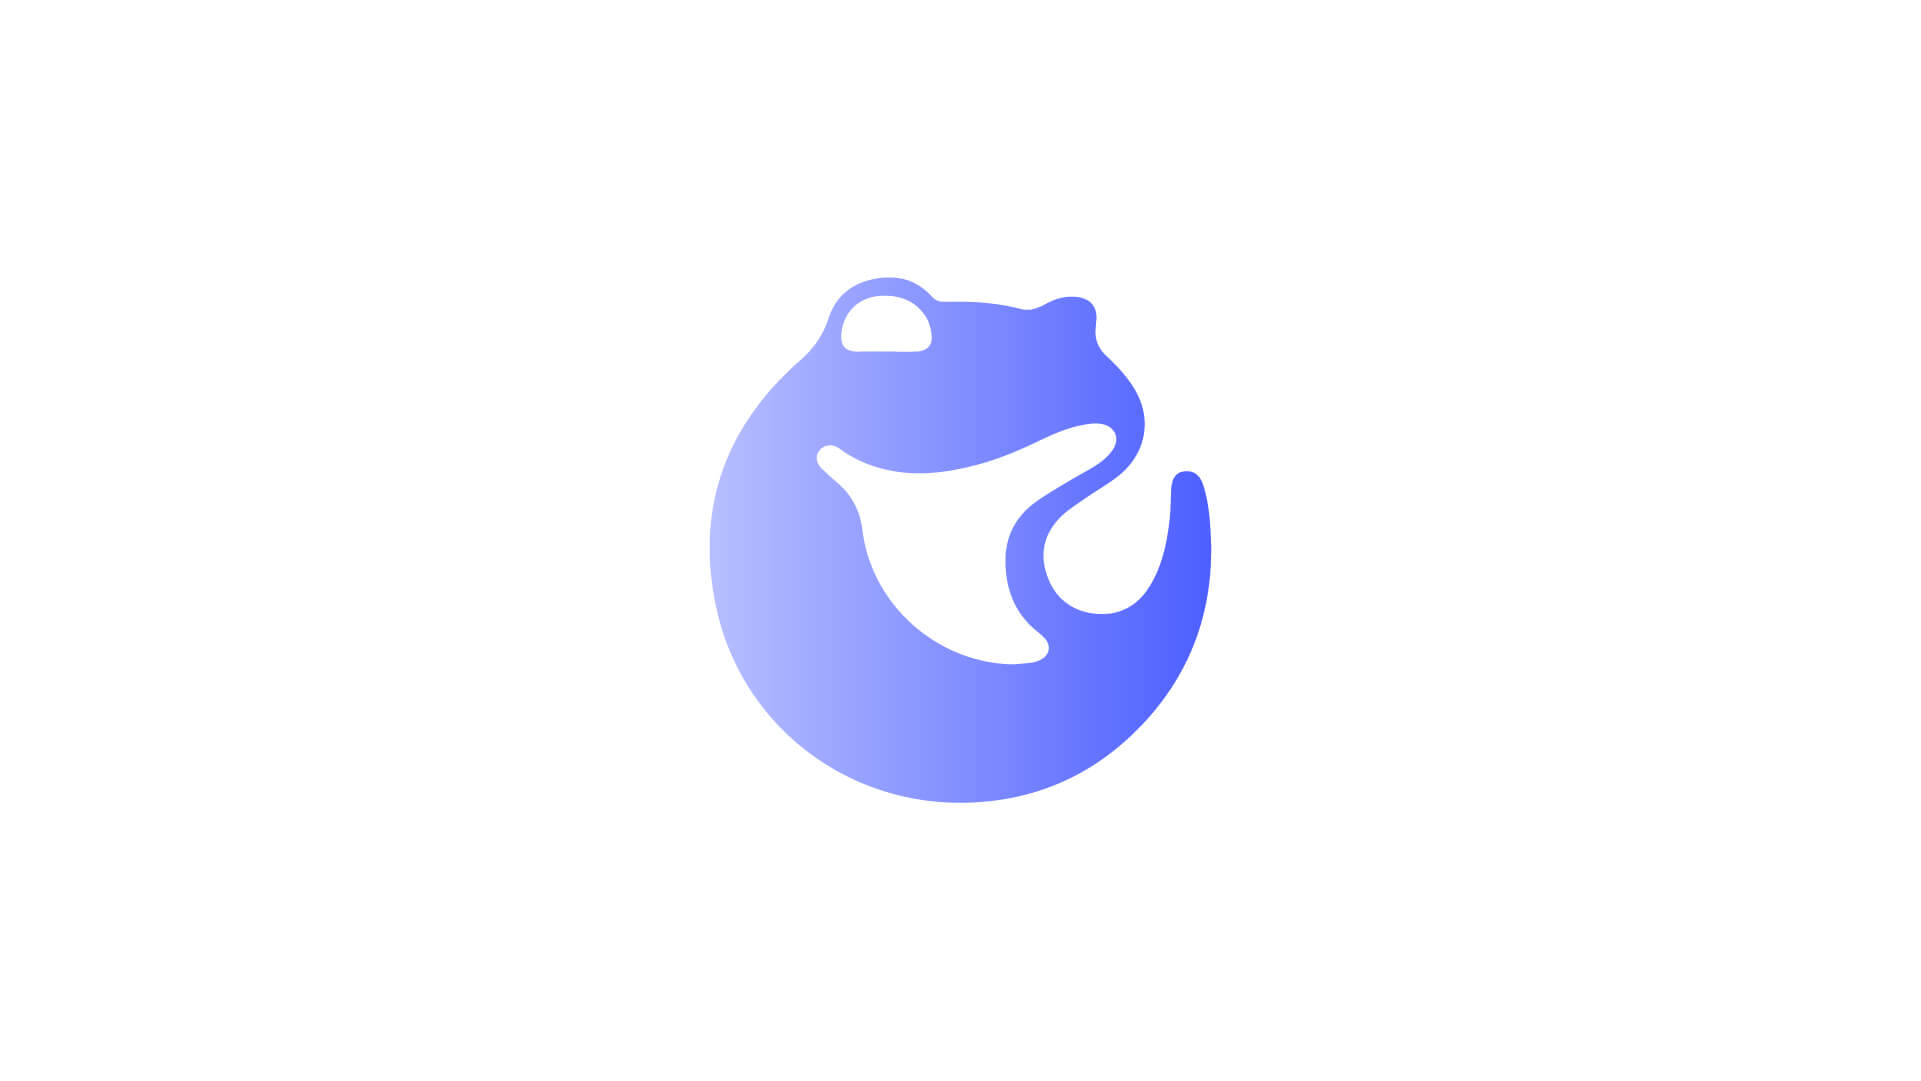 Psychoactive studio's logo